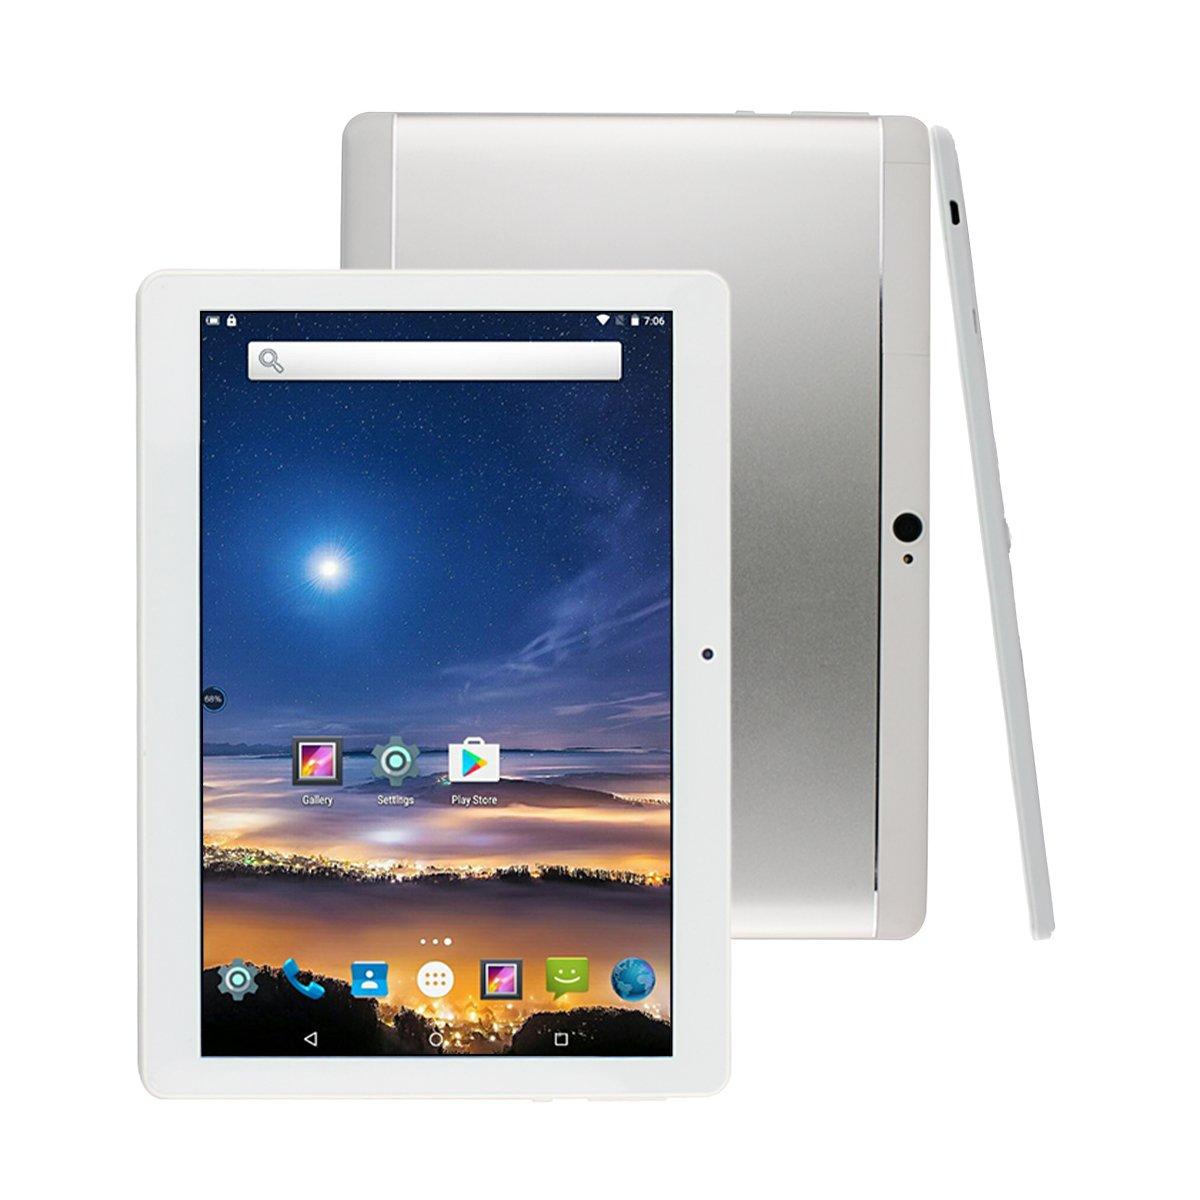 Fonxa 10 Zoll Tablet PC, with Protect Case, 2GB: Amazon.de: Computer ...